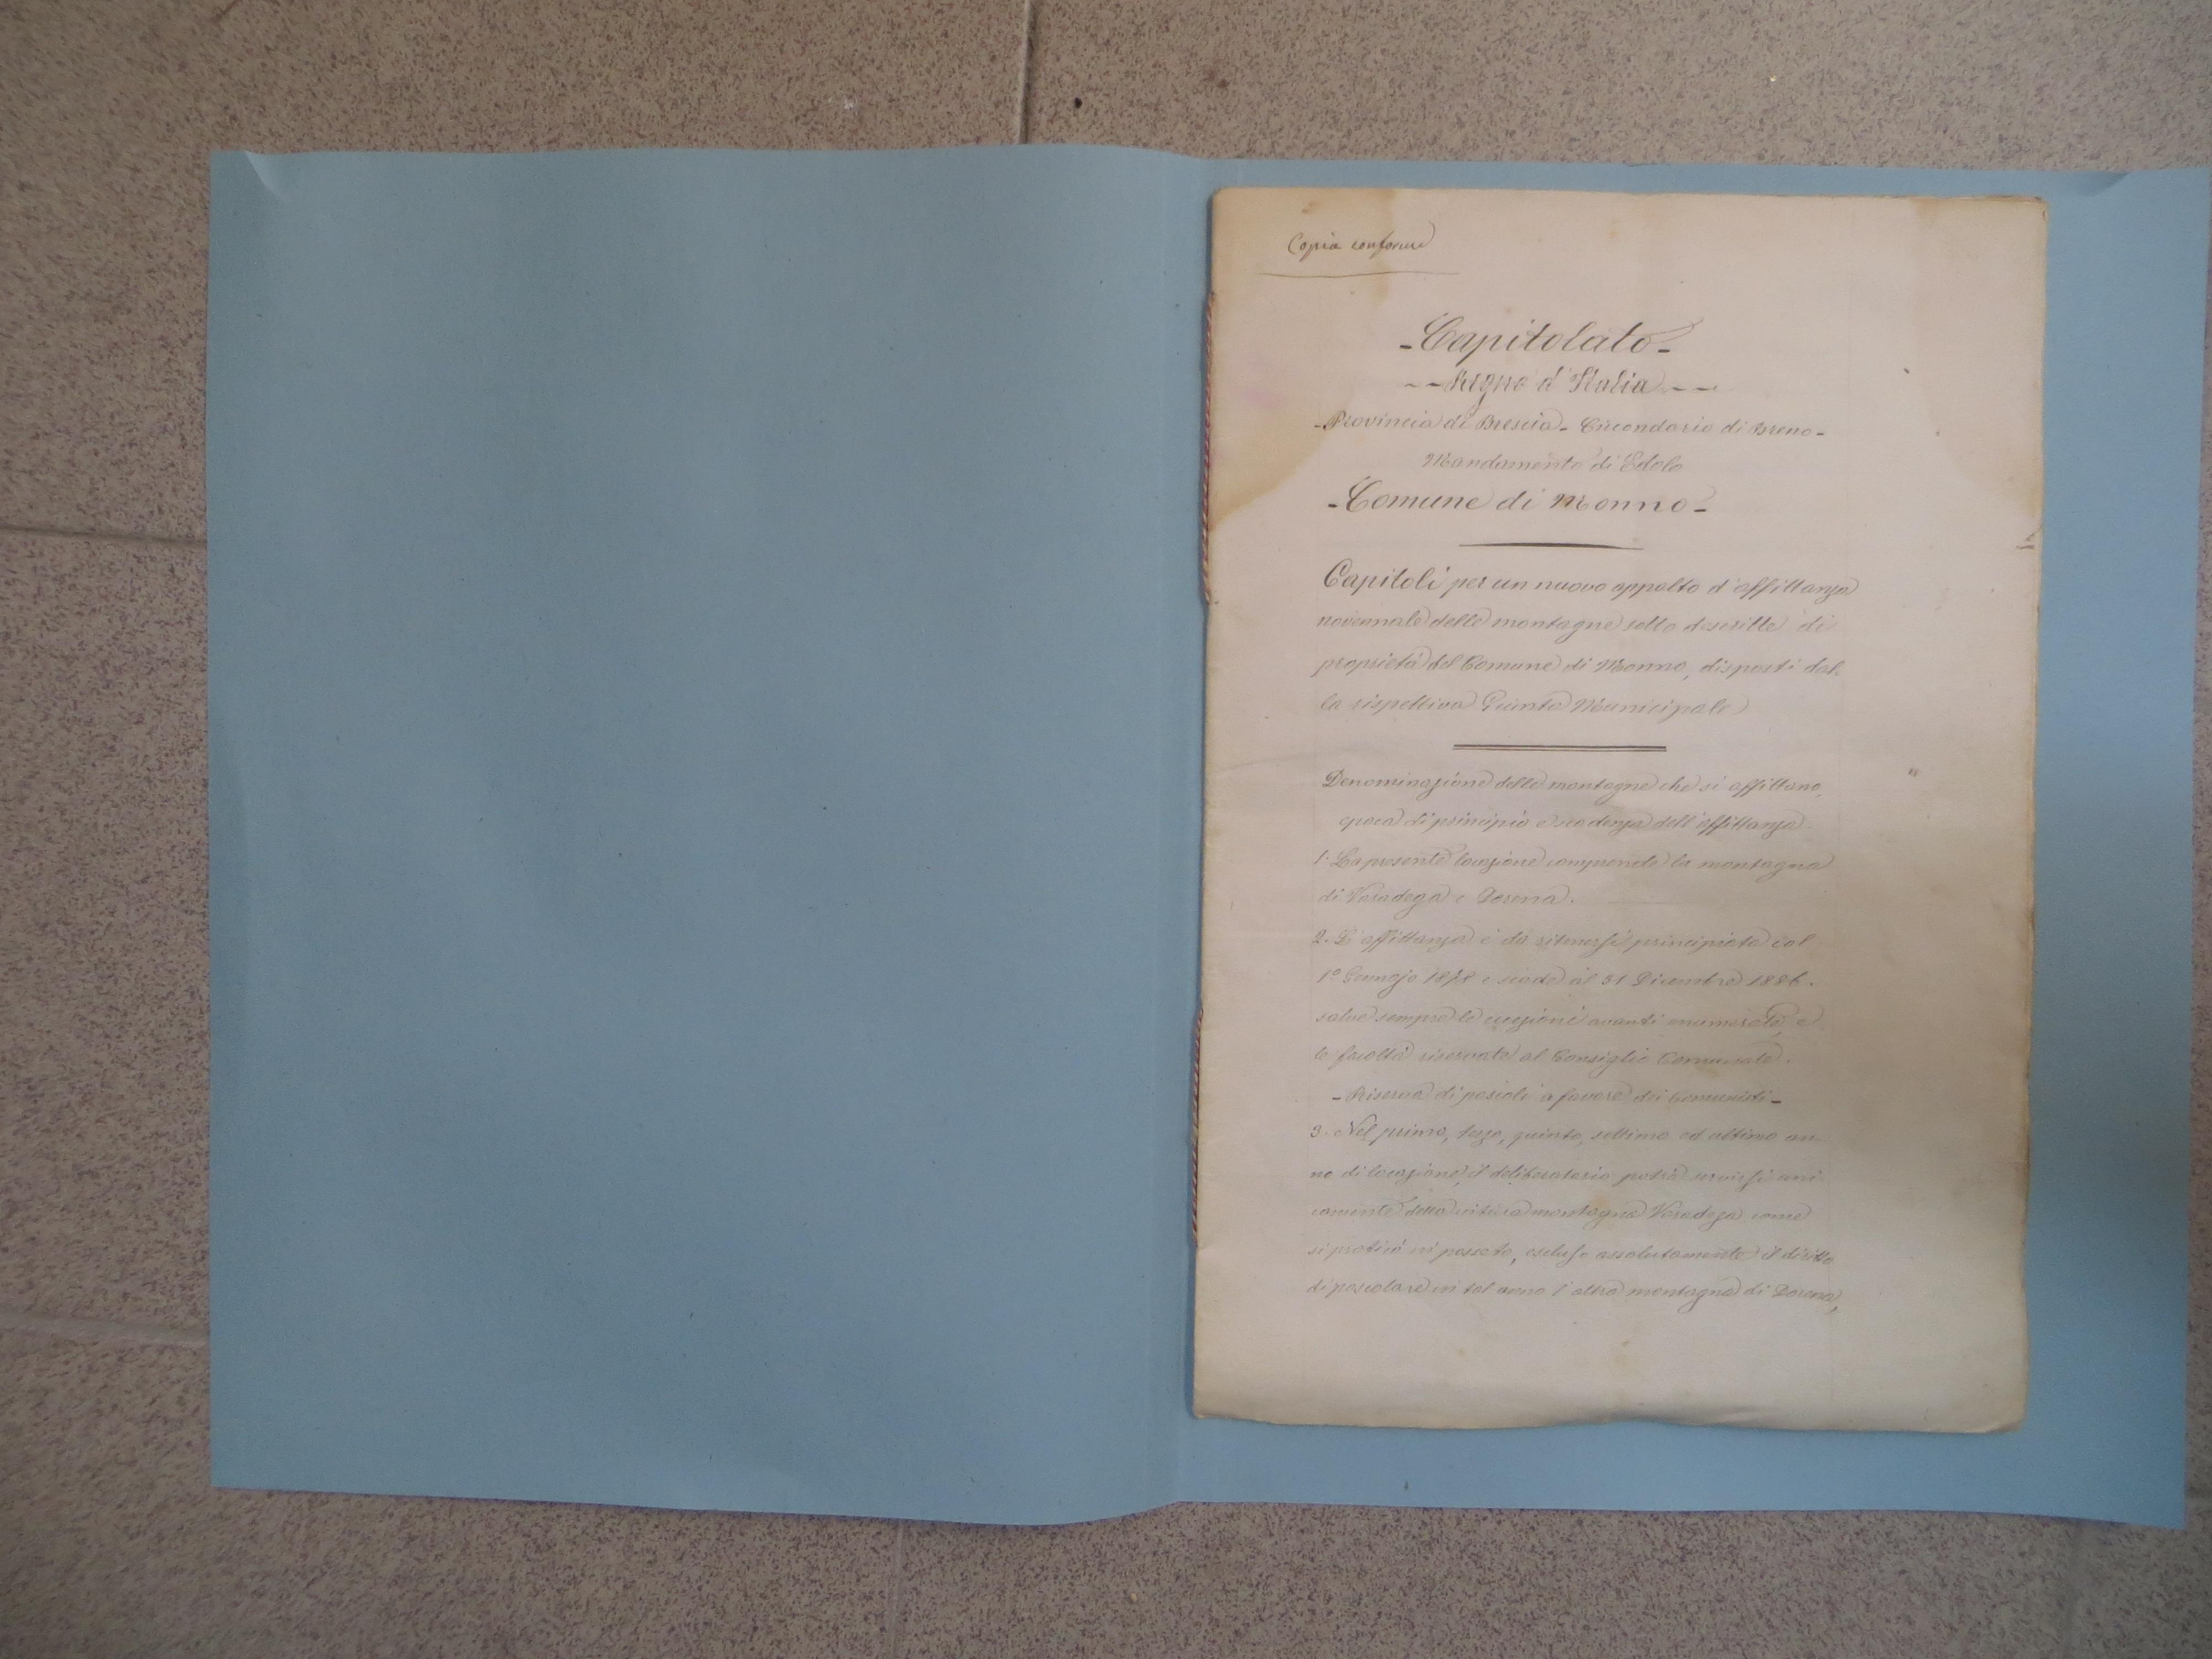 IMG_0025 - Capitoli affittanza malghe Varadega Dorena 1877